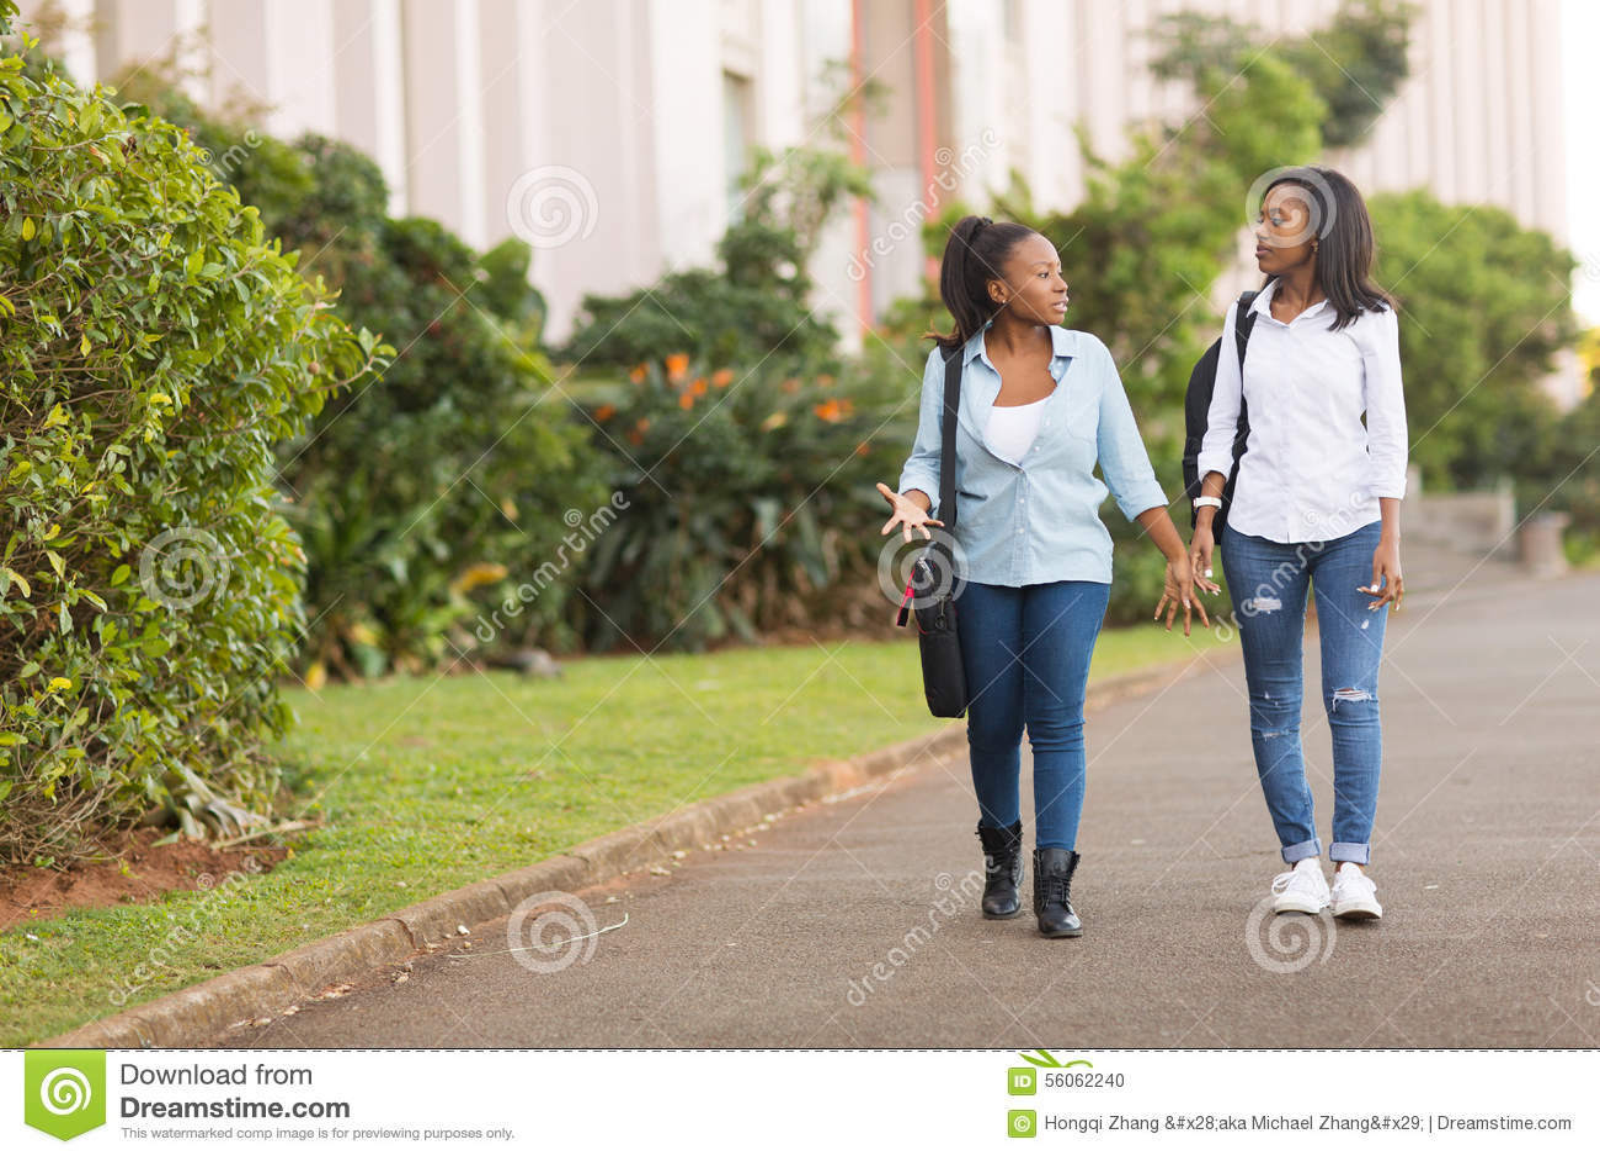 Estudantes que andam junto